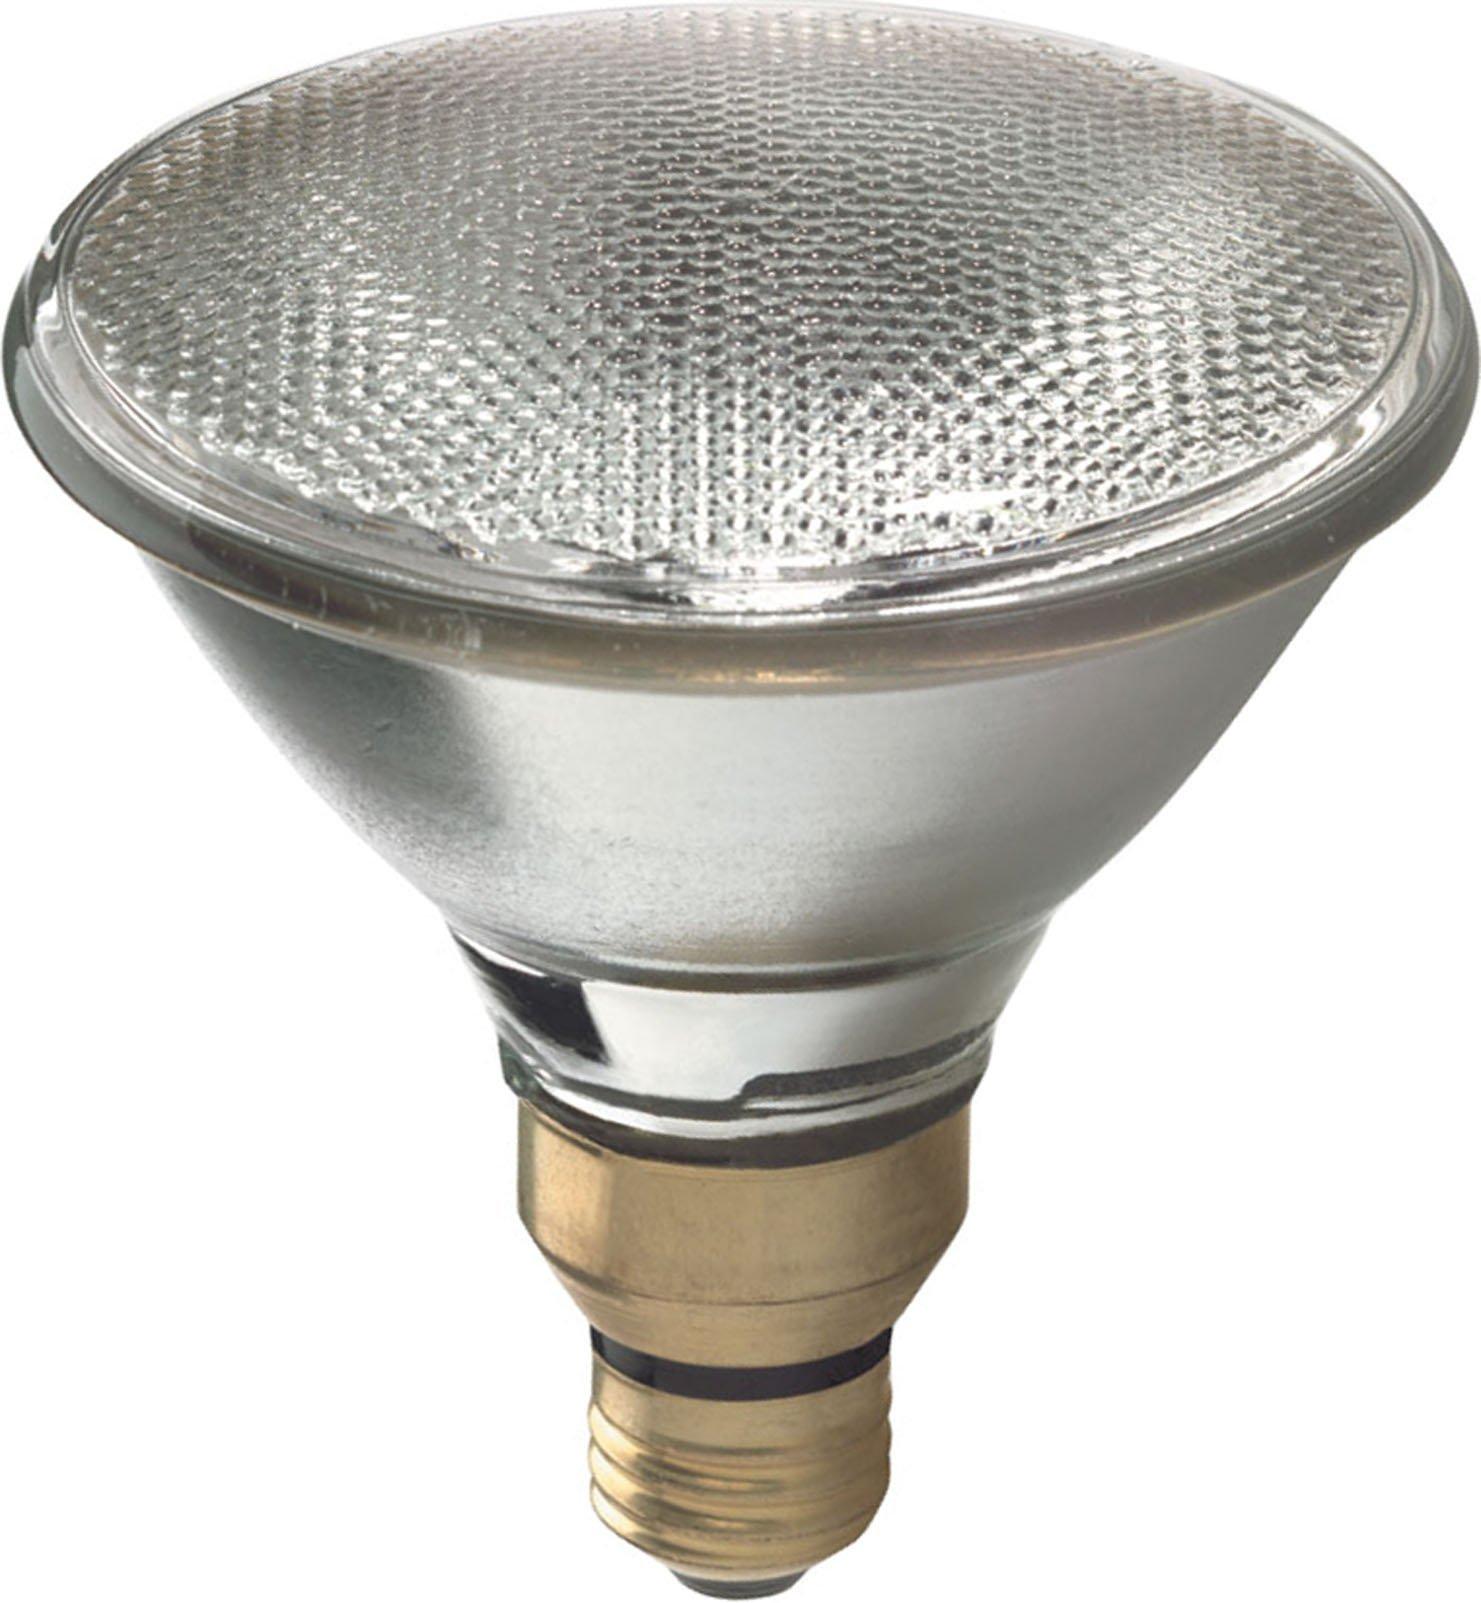 GE Lighting 66282 Energy-Efficient Halogen 80-Watt (120-watt replacement) 1600-Lumen PAR38 Floodlight Bulb with Medium Base, 2-Pack